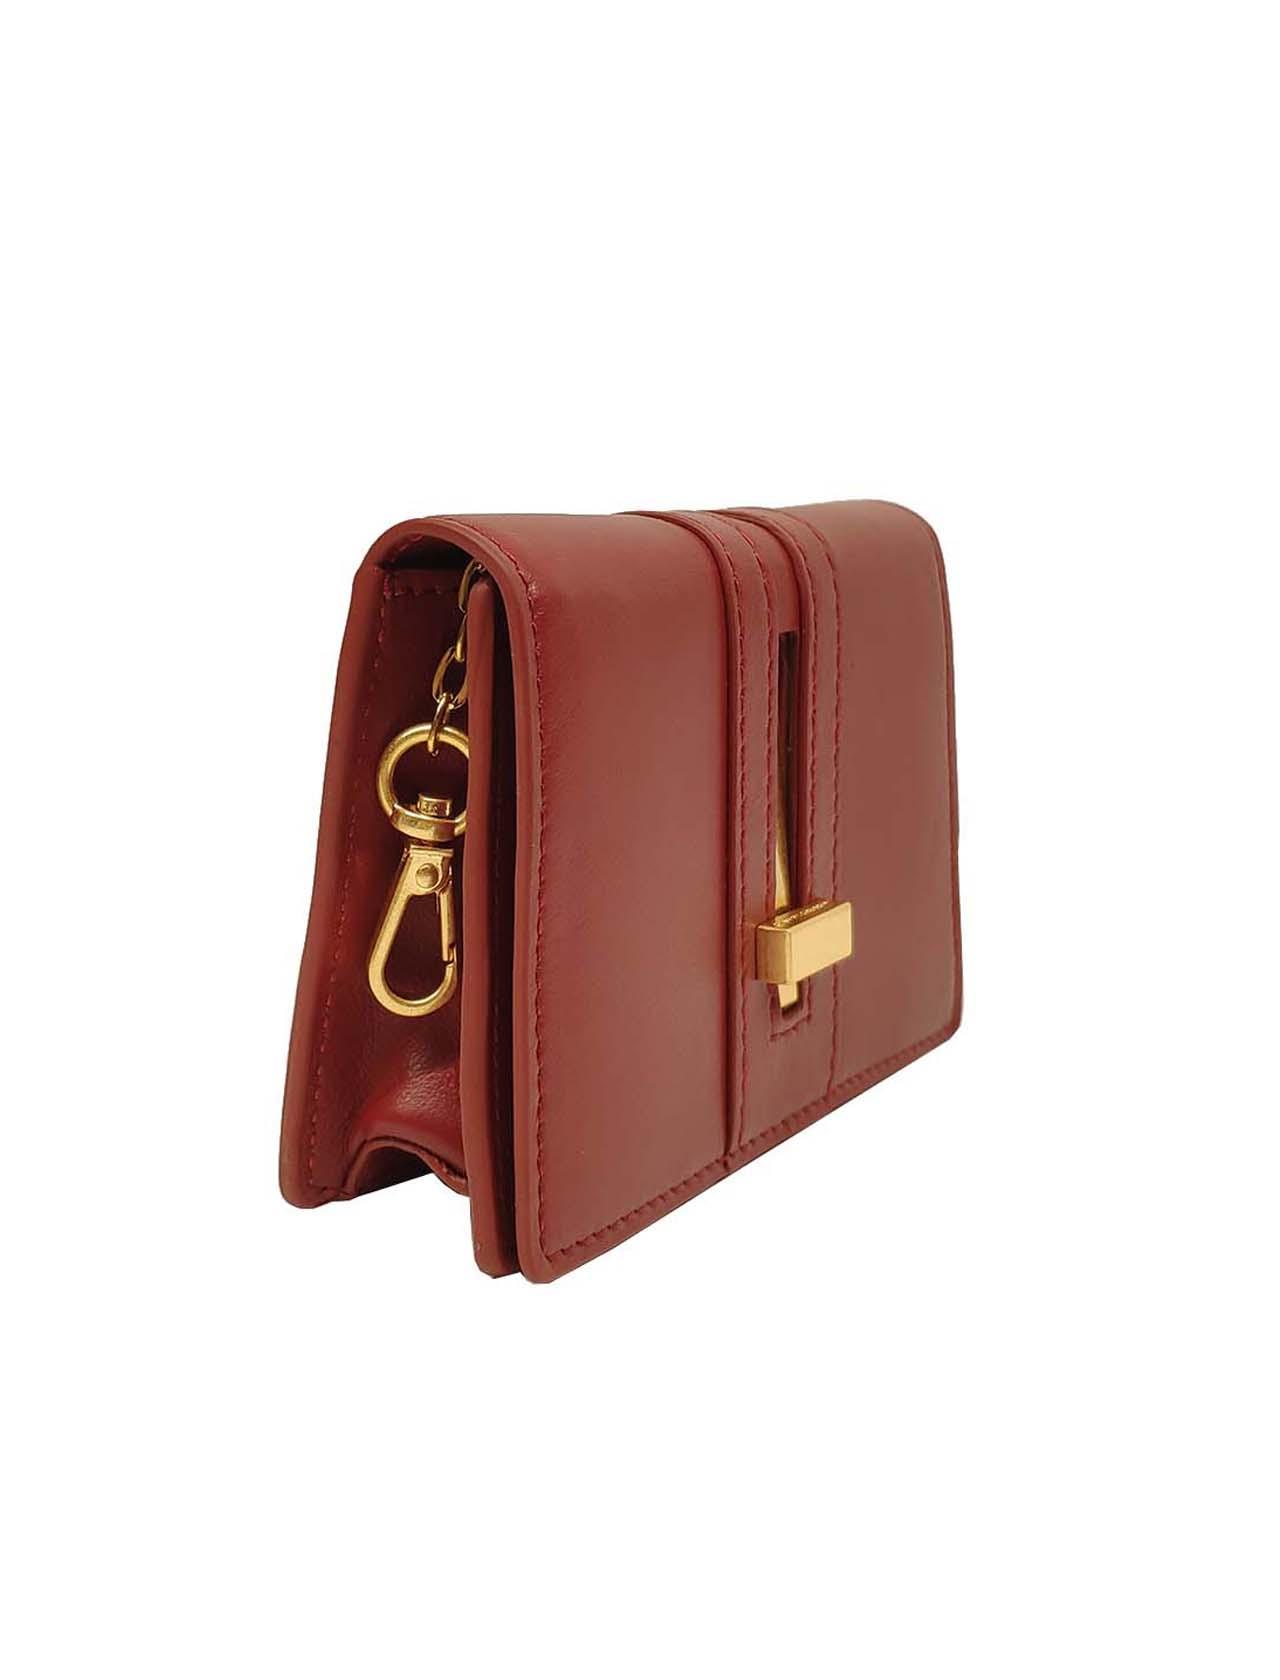 Micro Precious Bag Gianni Chiarini | Bags and backpacks | BSM8330CERALACCA